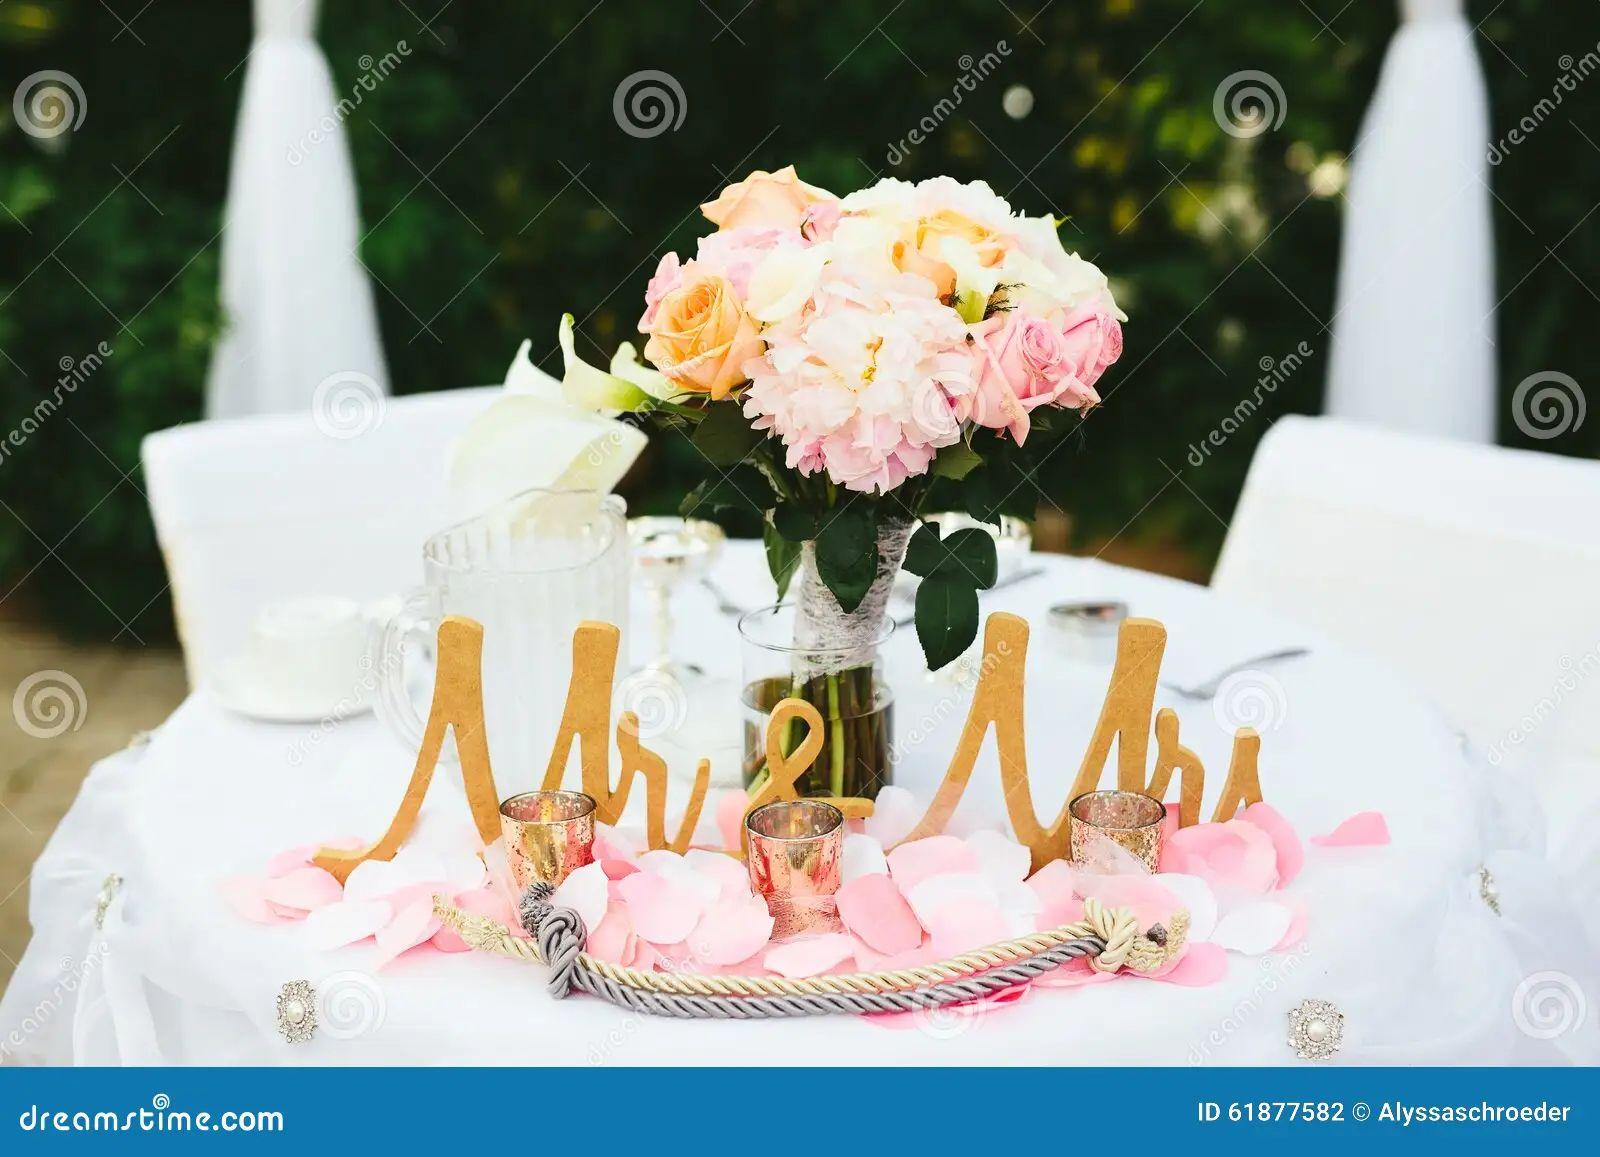 grooms table decoration ideas bride groom wedding table decorations bride groom wedding table decorations bouquet